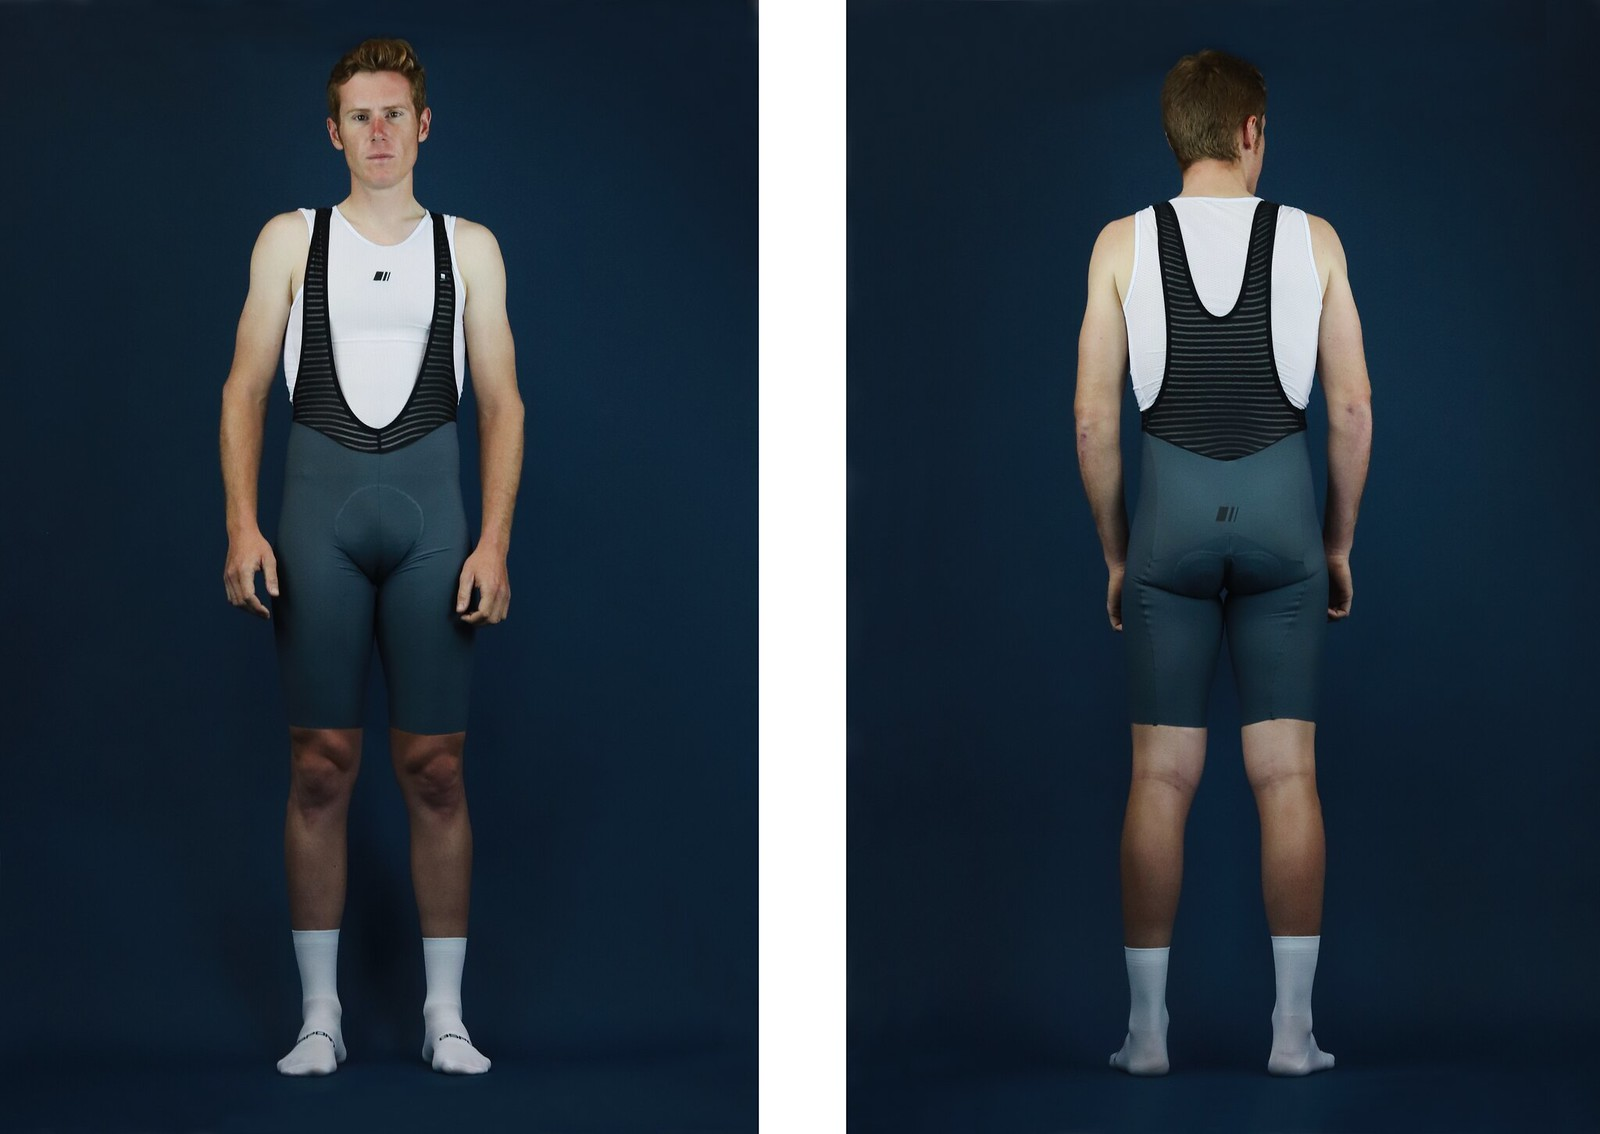 Men's Pro Skin Bib Short Fit